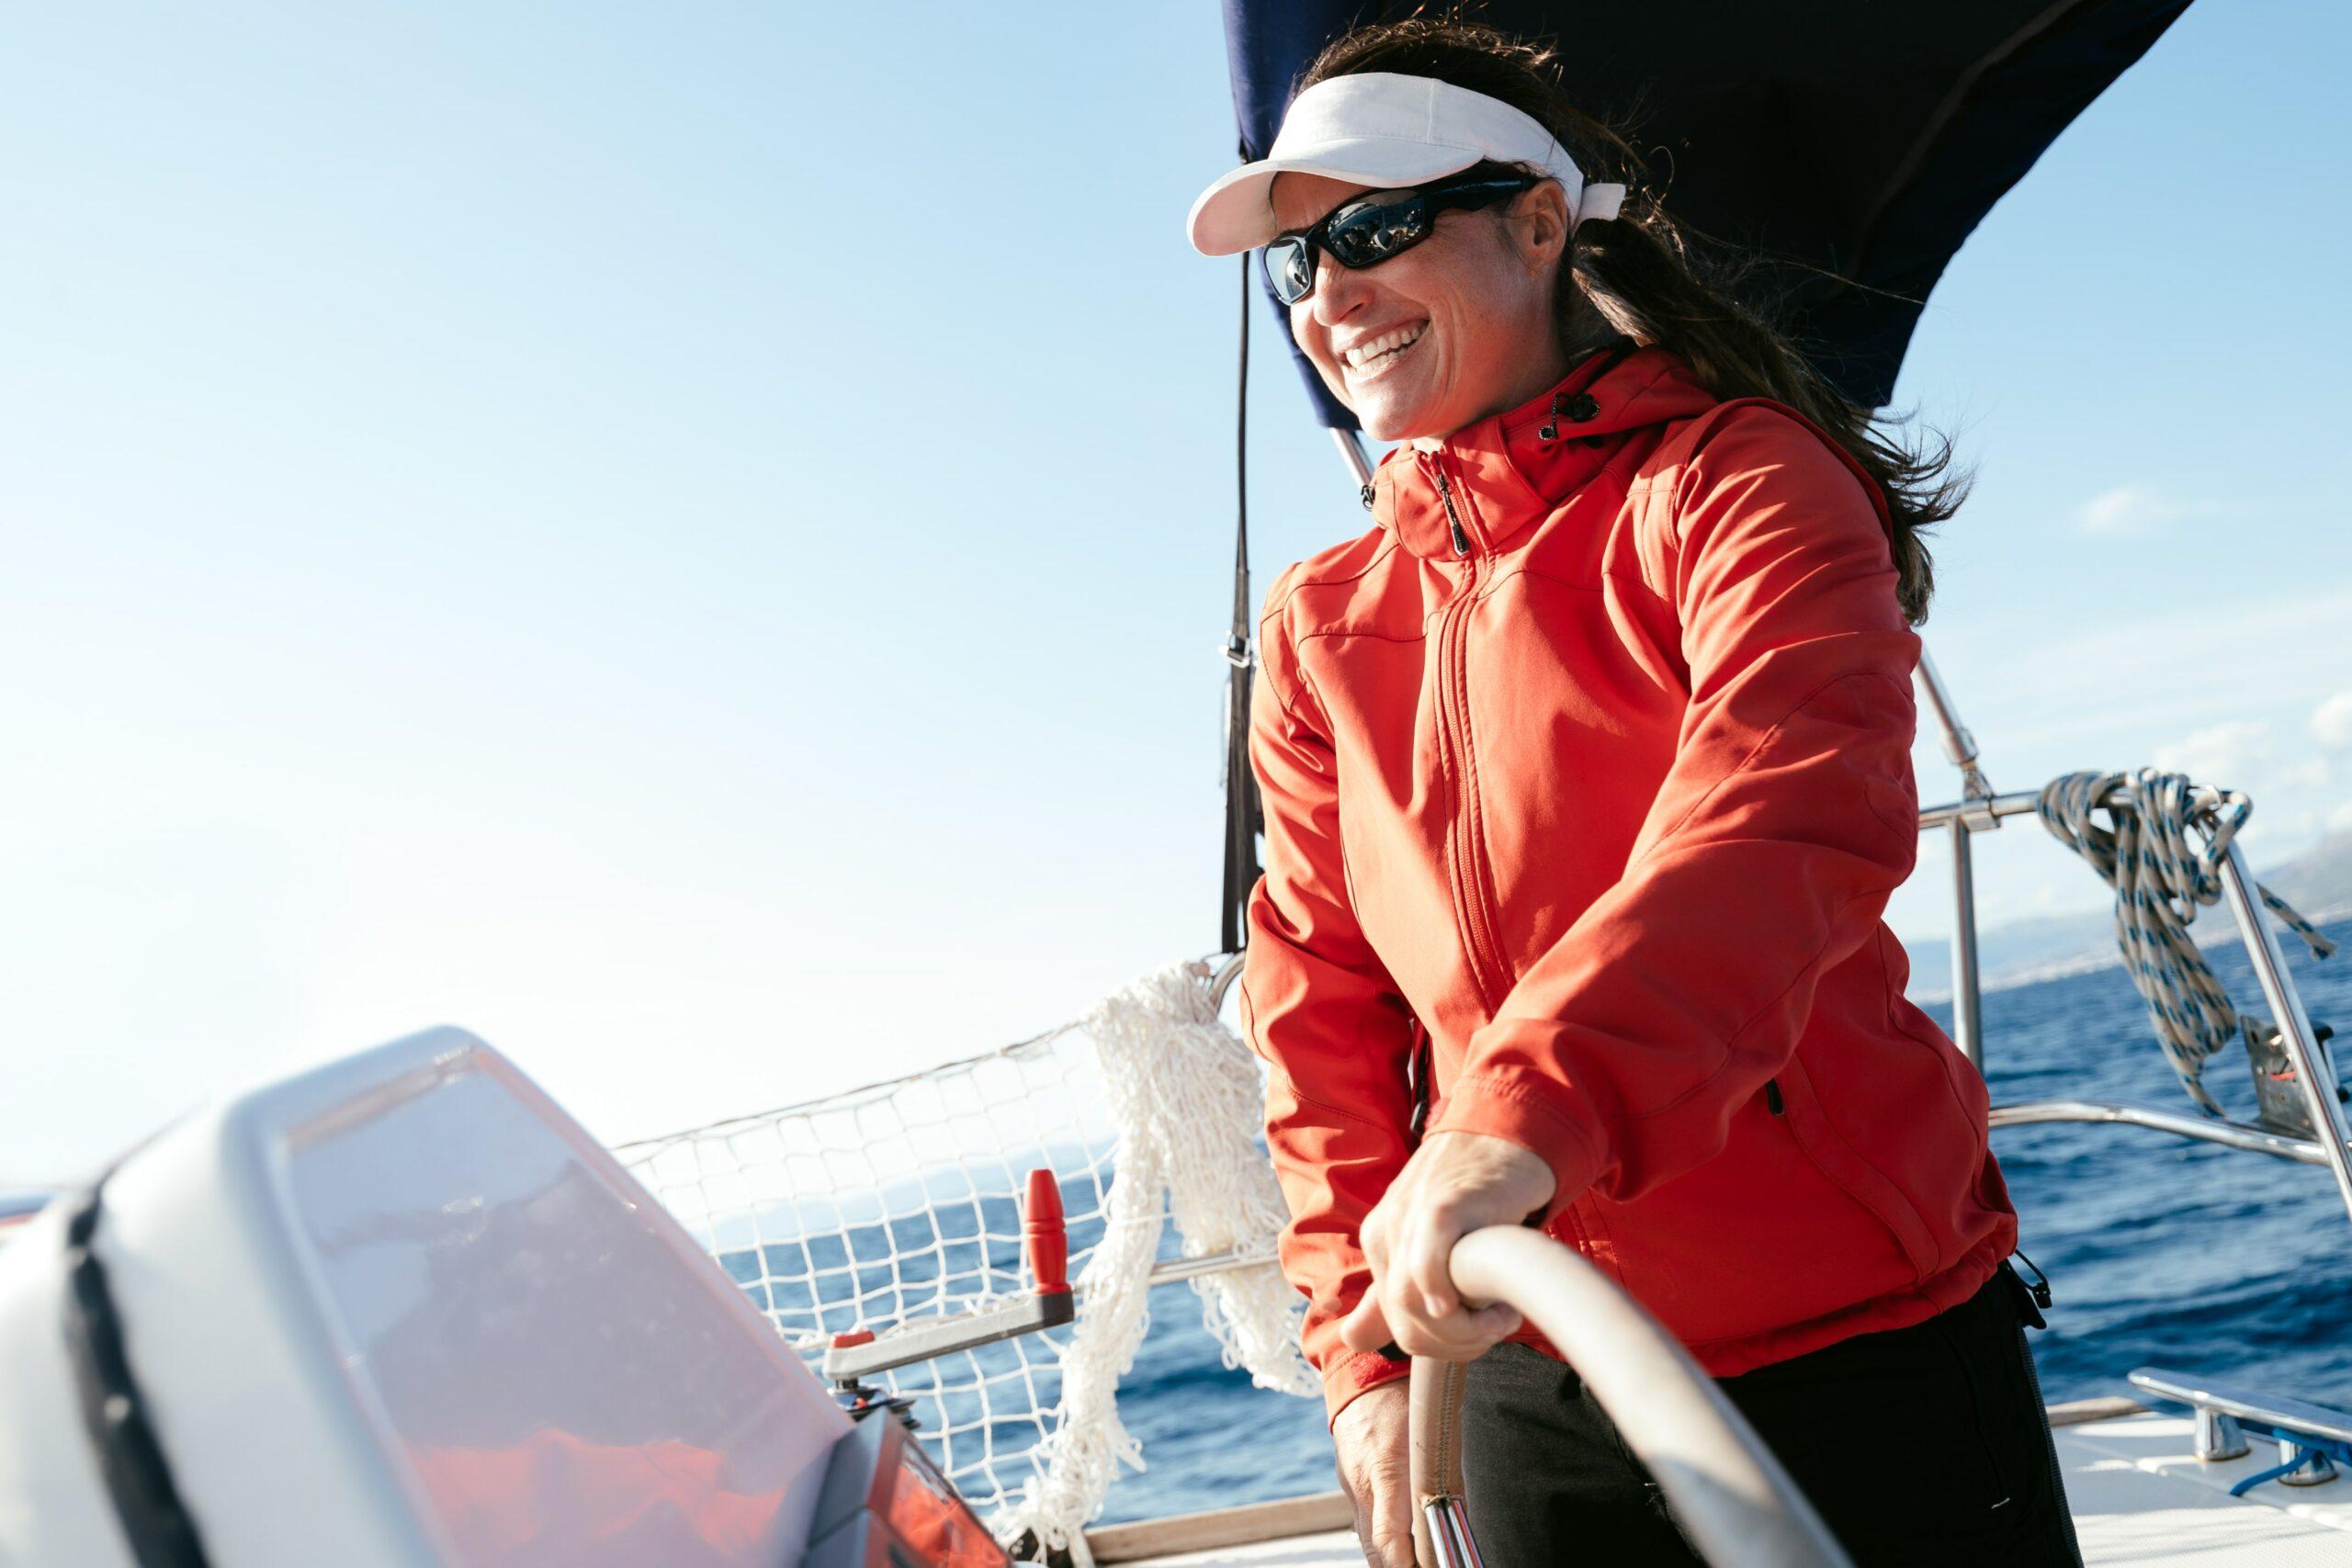 Woman sailing and smiling